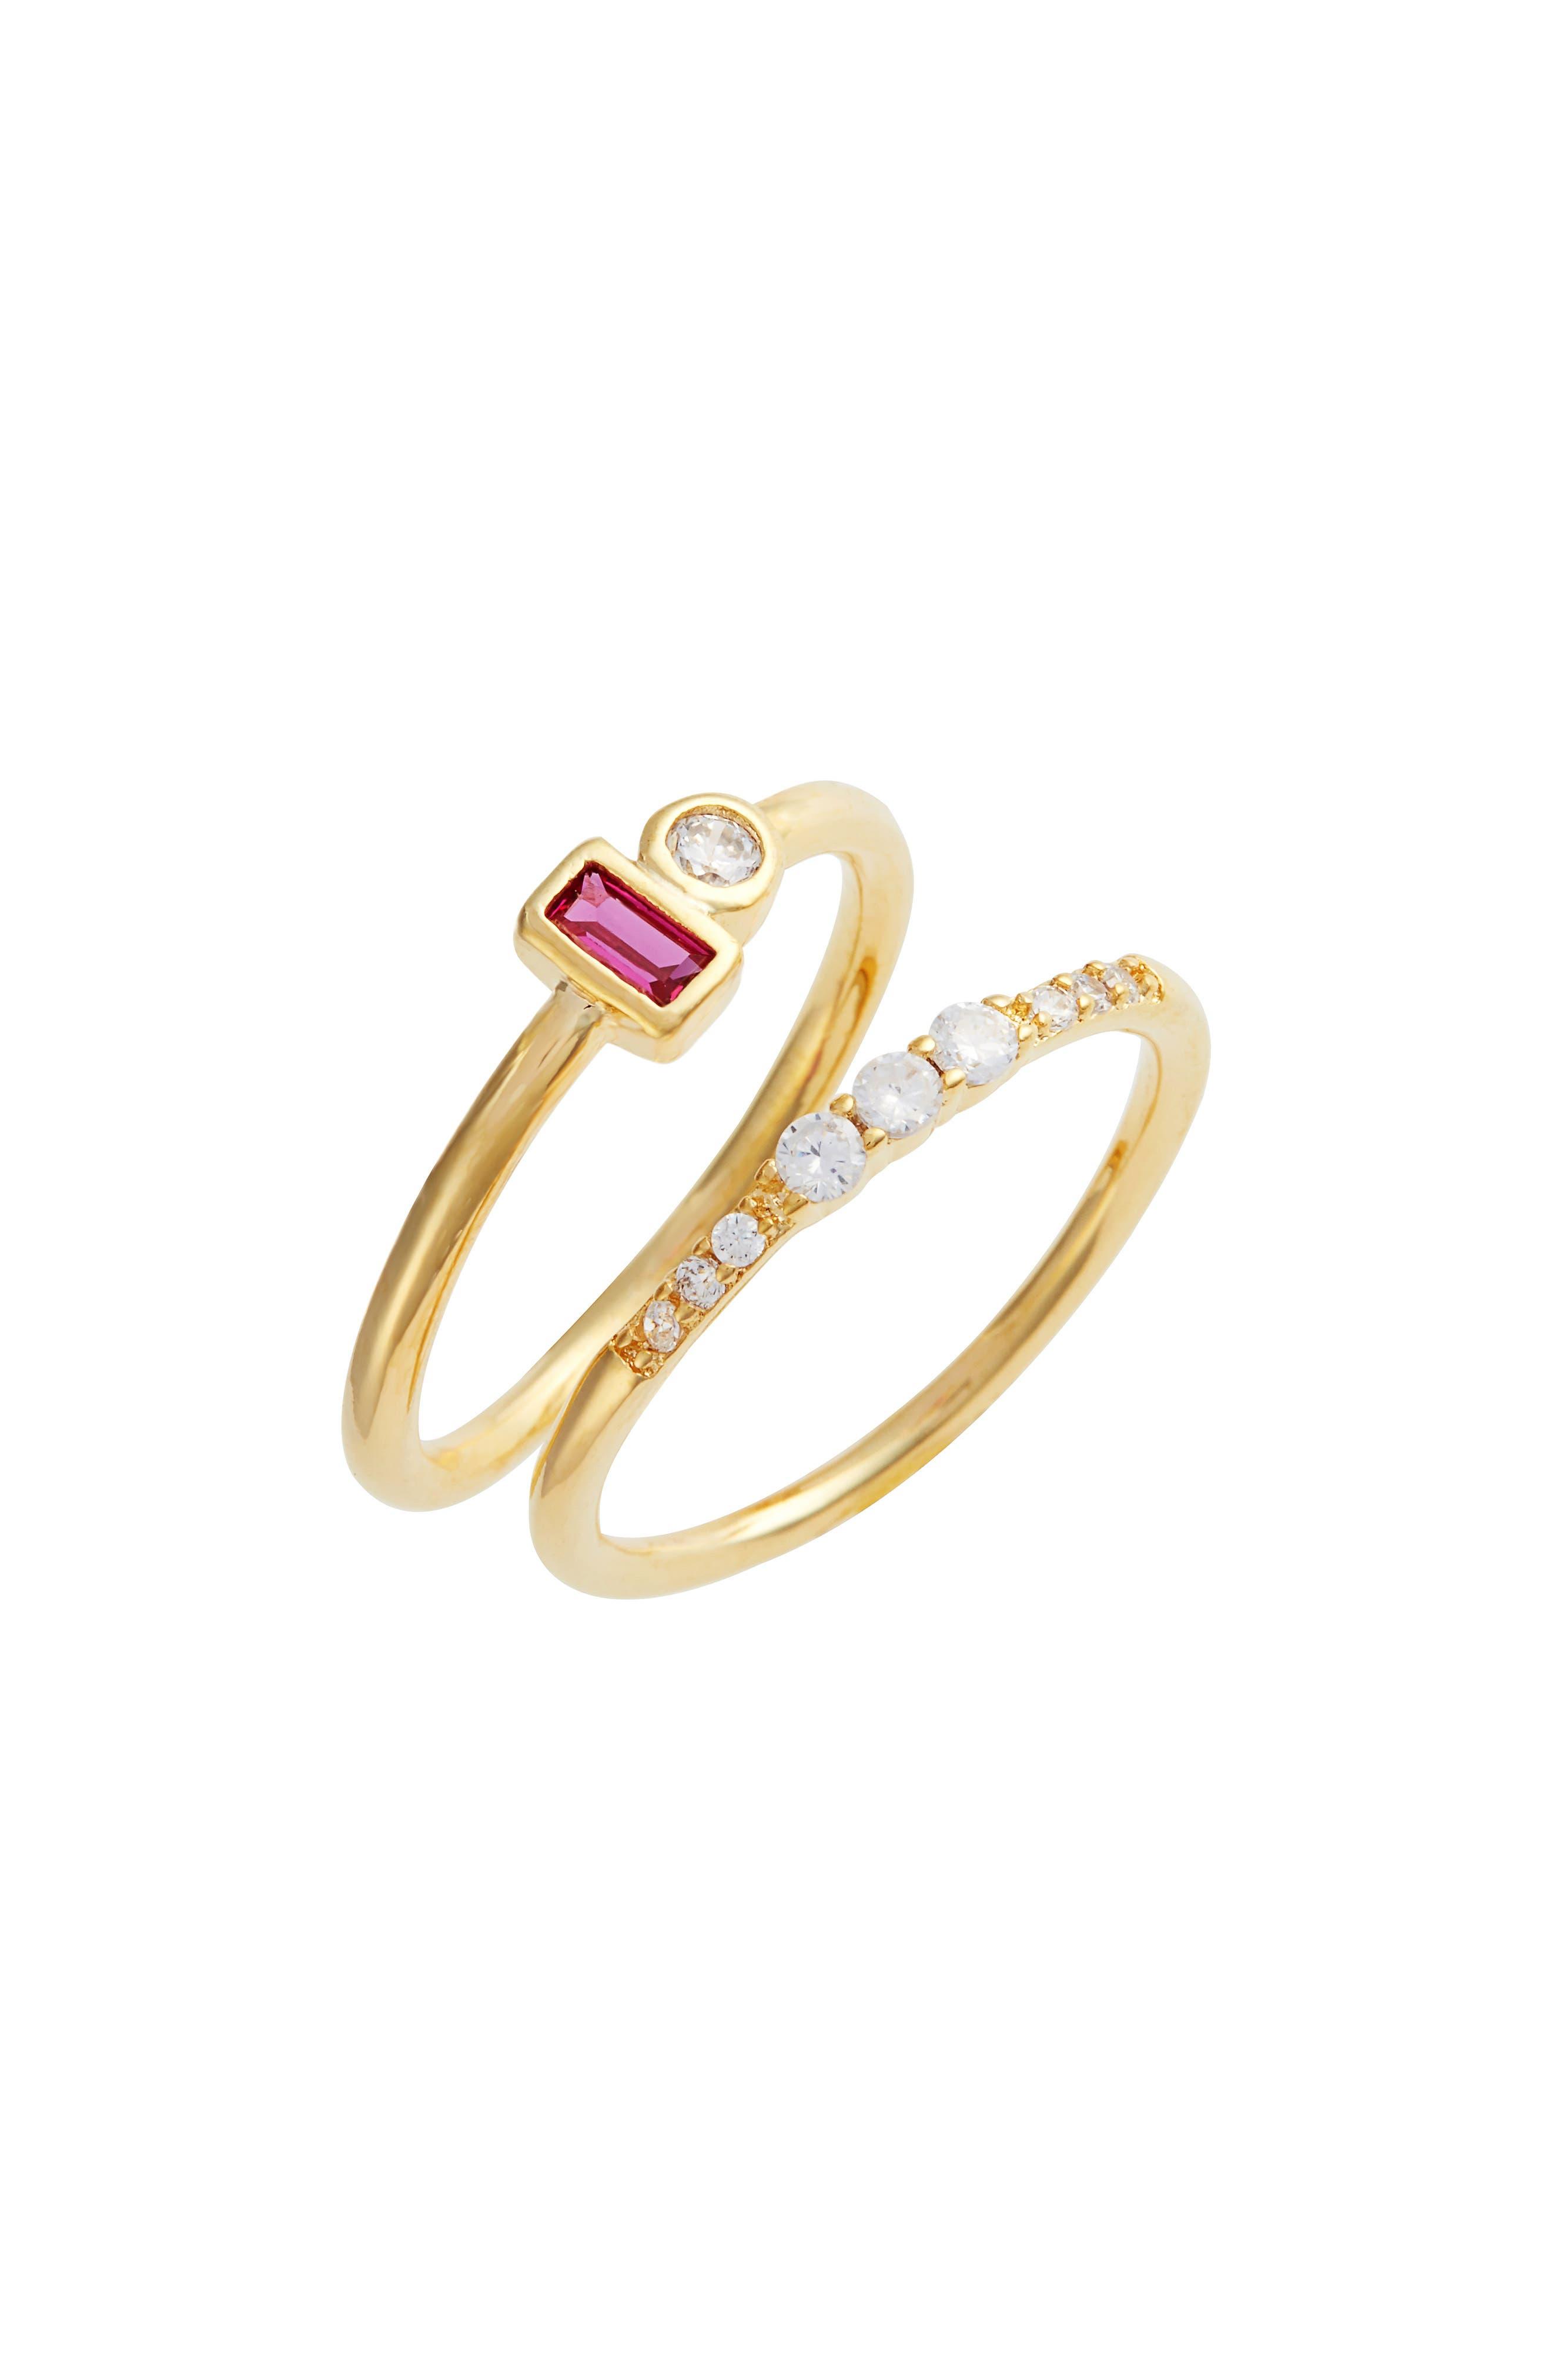 Tatiana Set of 2 Garnet & Crystal Rings,                         Main,                         color,